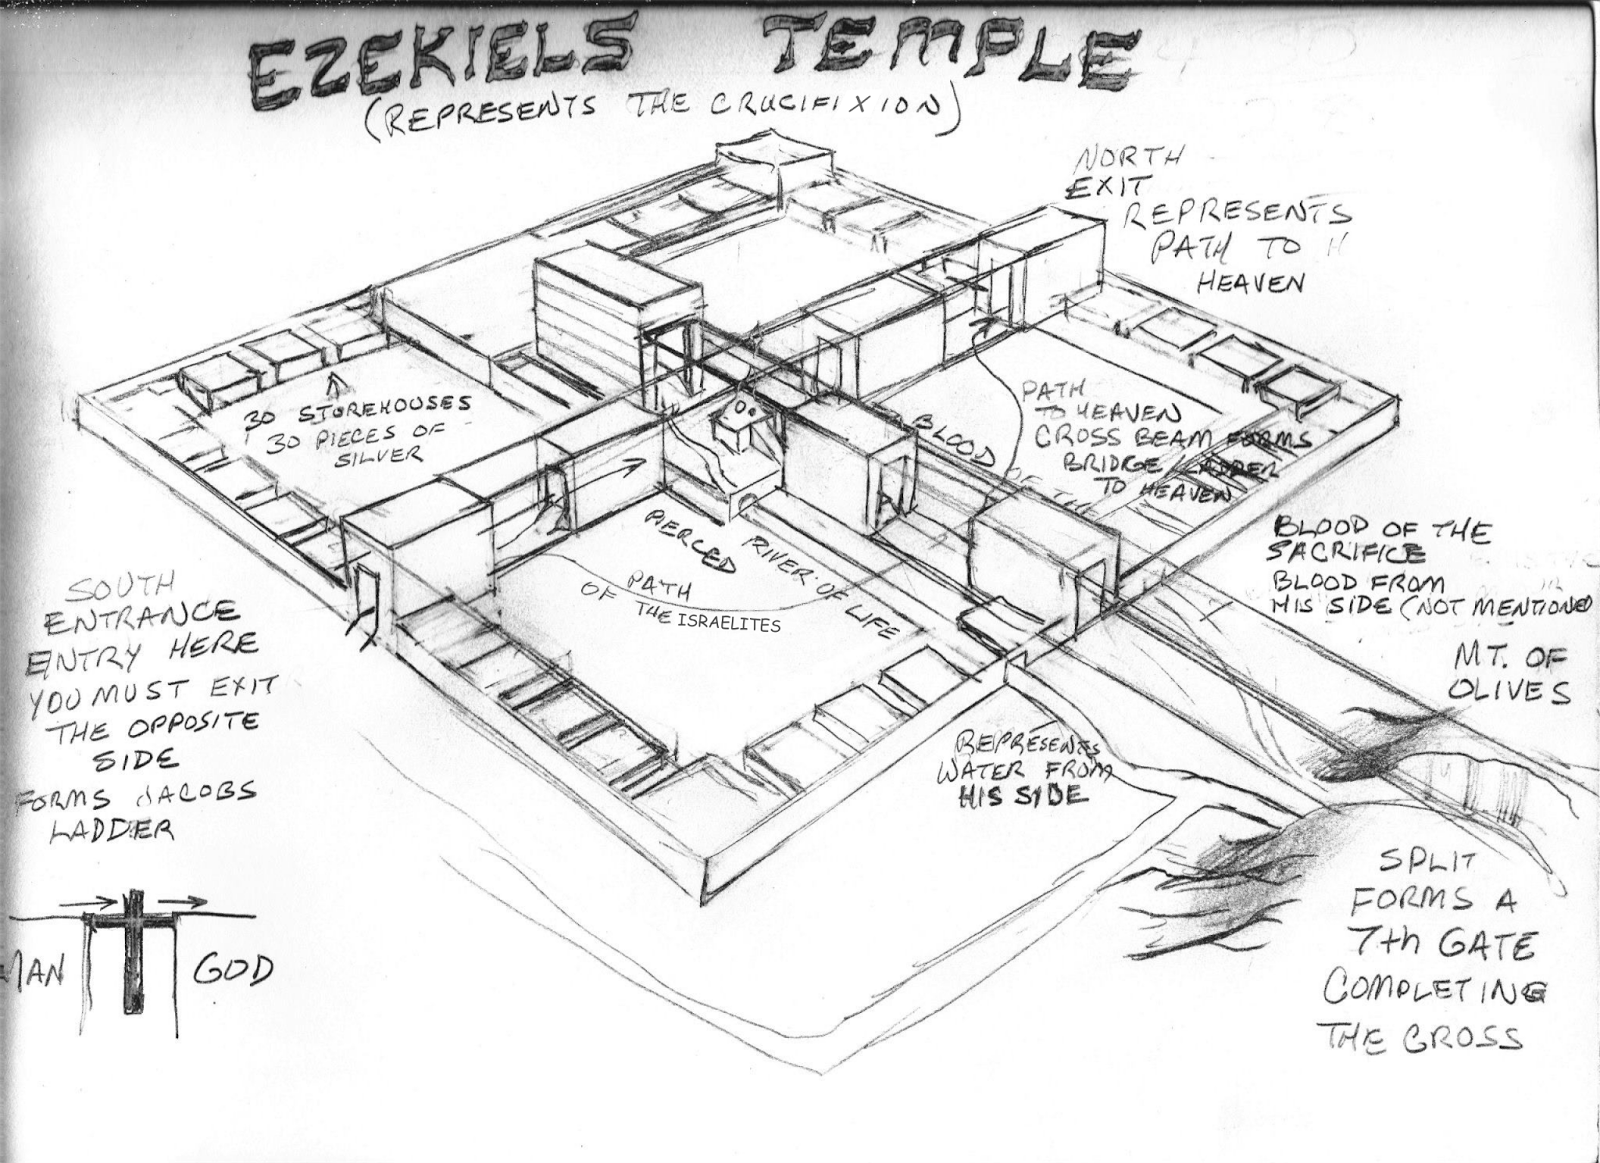 1600x1163 The House Of God Ezekiel's Temple